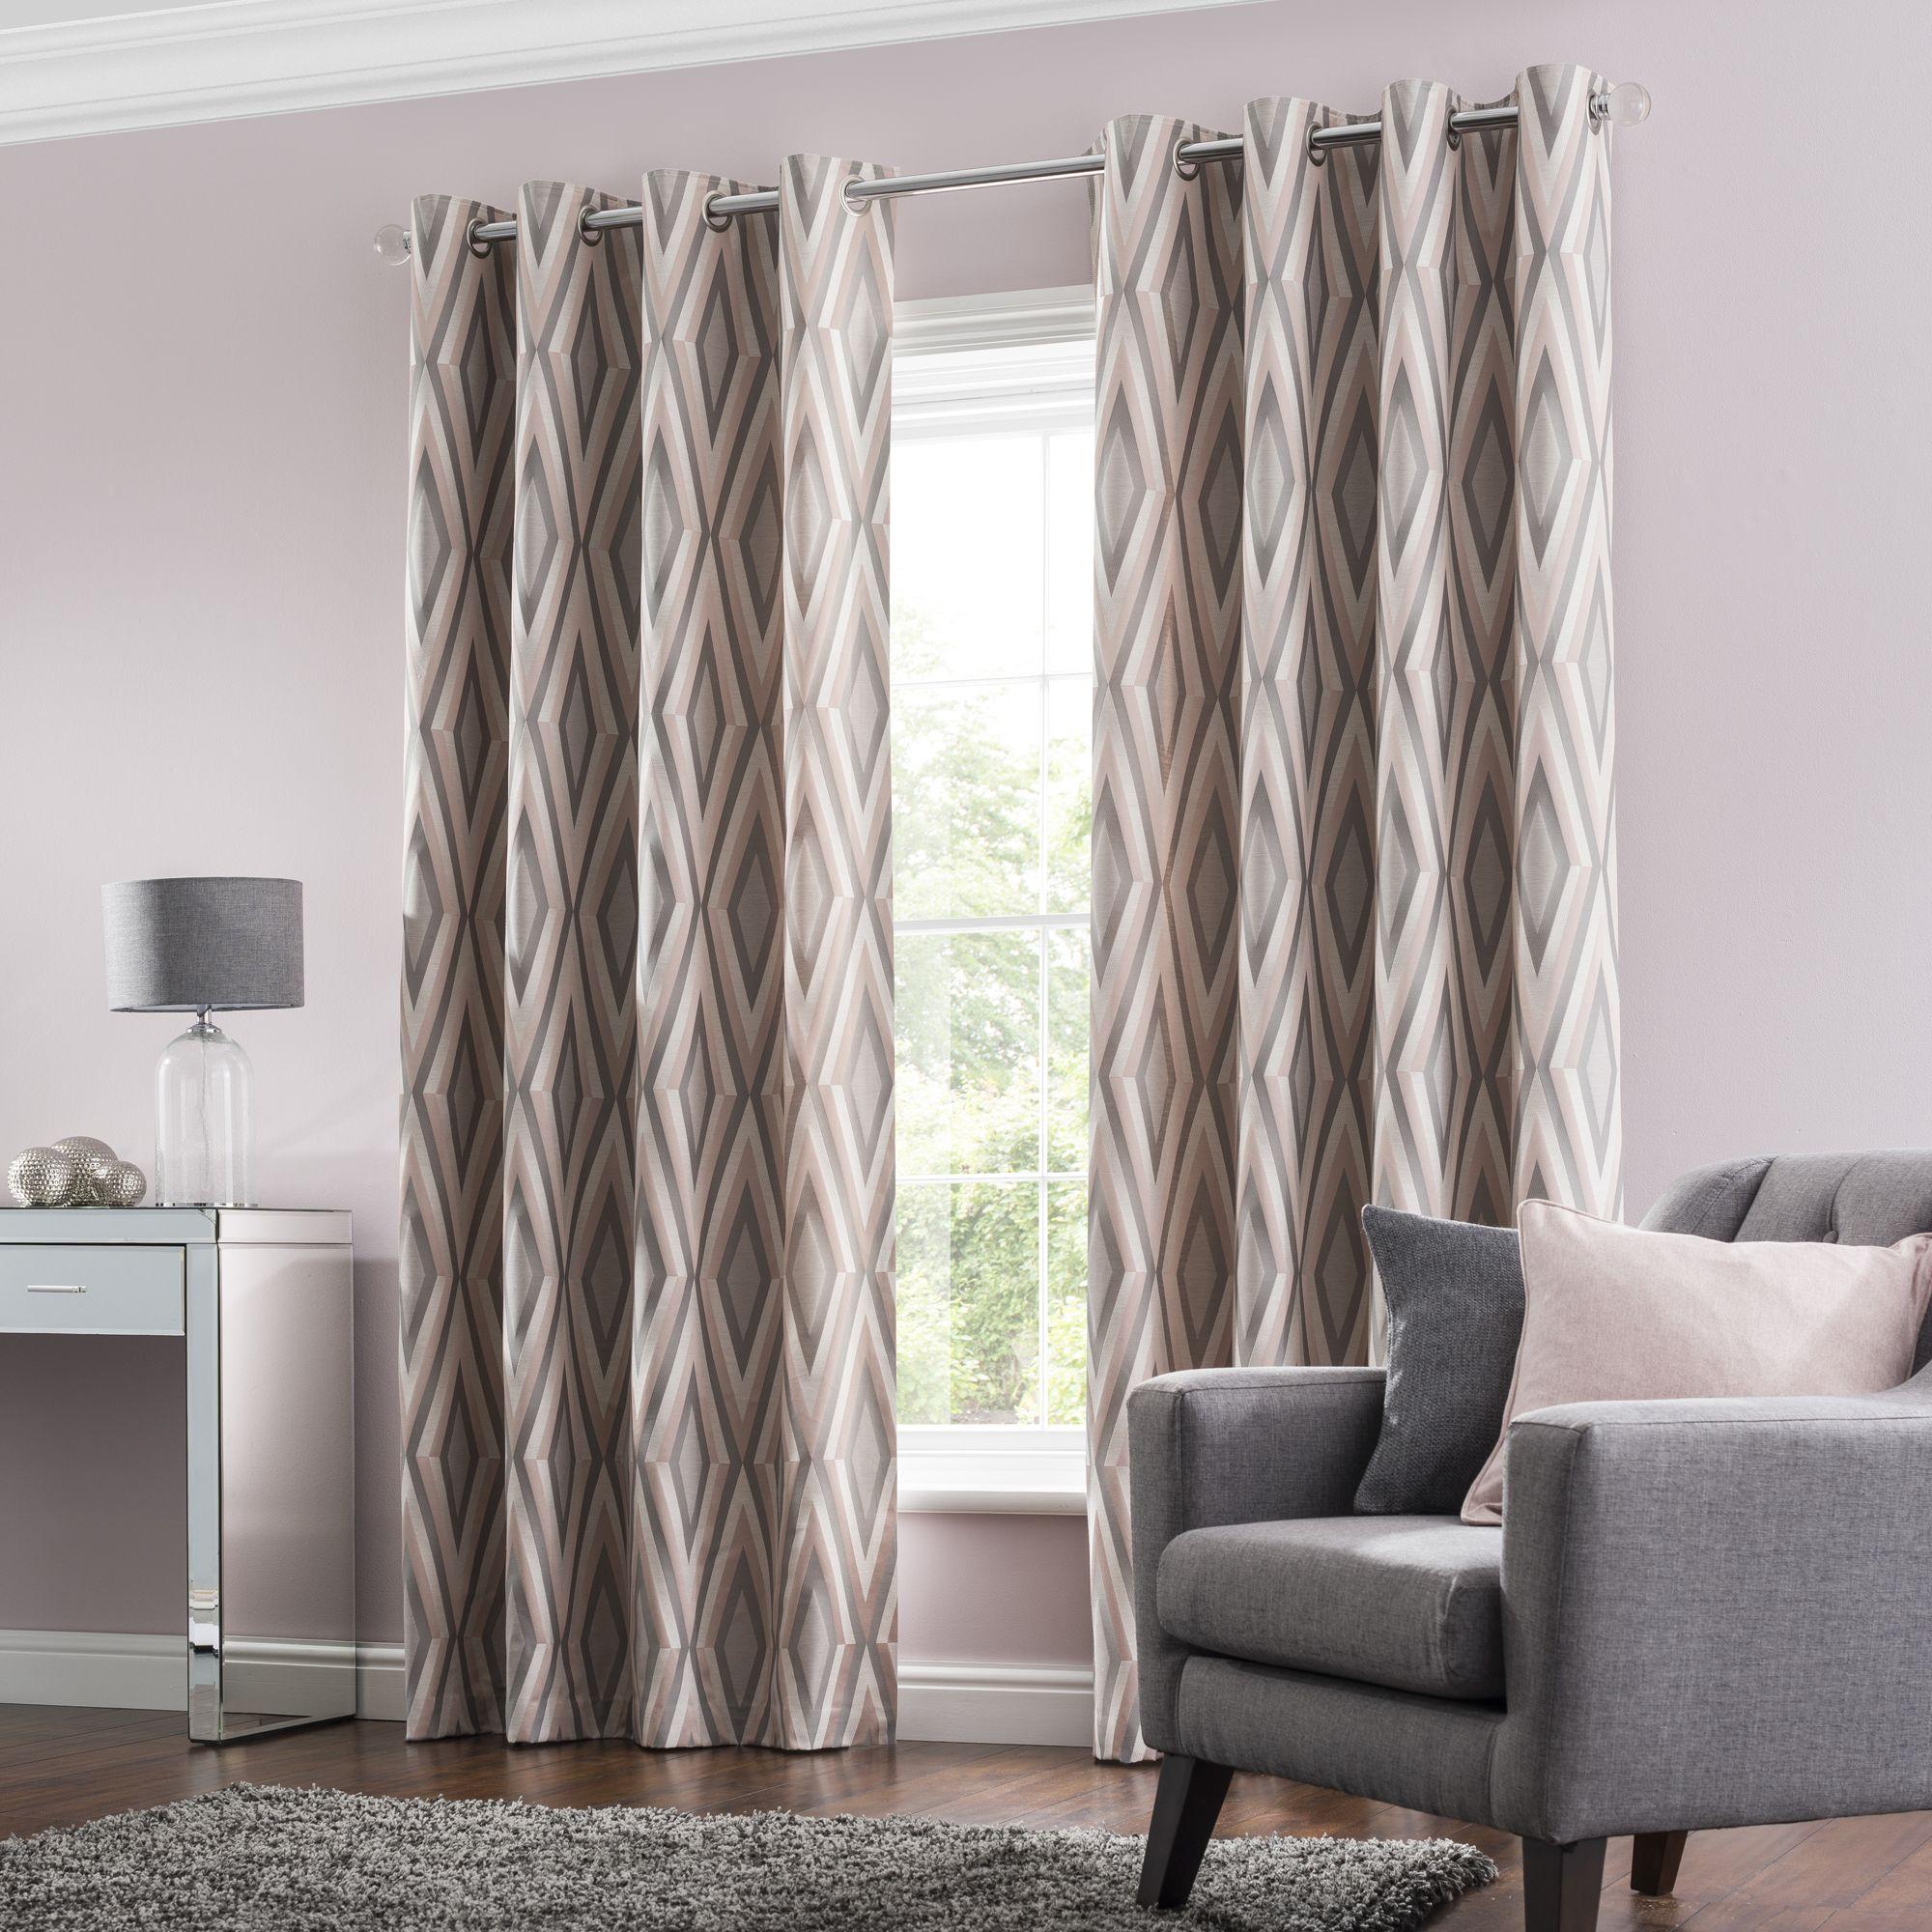 Diamond Jacquard Blush Eyelet Curtains Grey Curtains Living